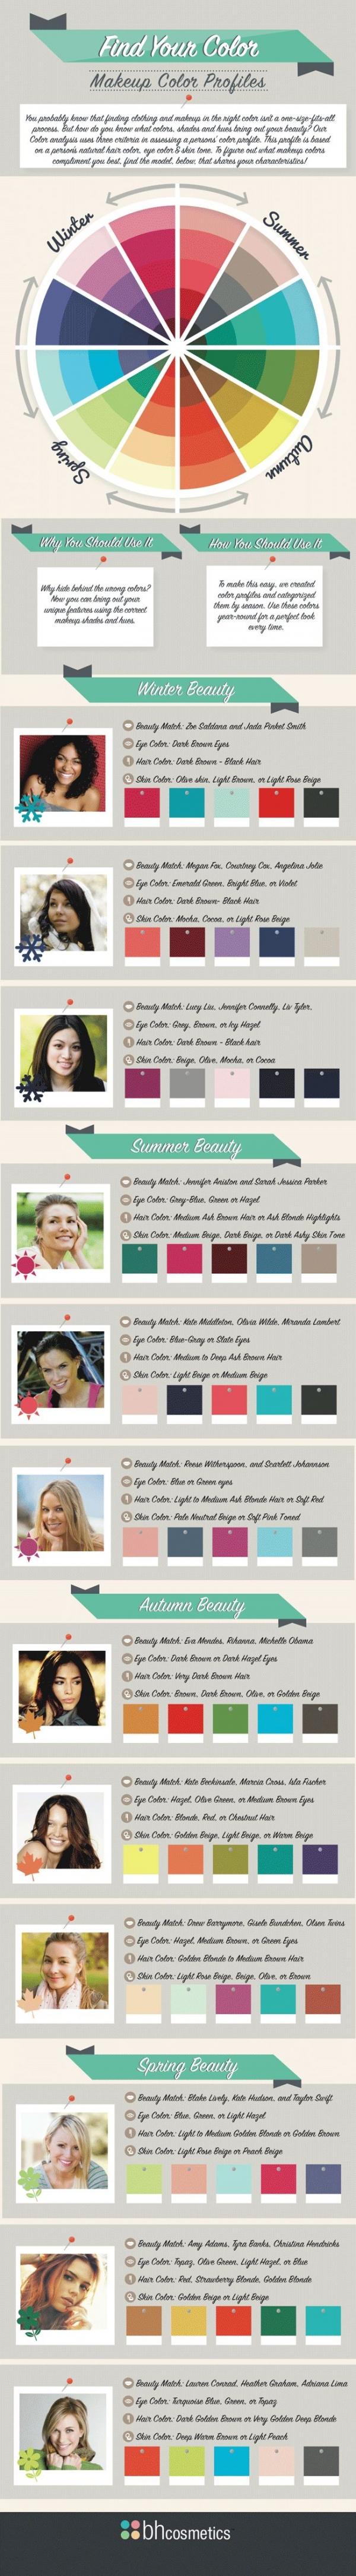 makeupandbodyblog:Makeup color profiles according to different seasons